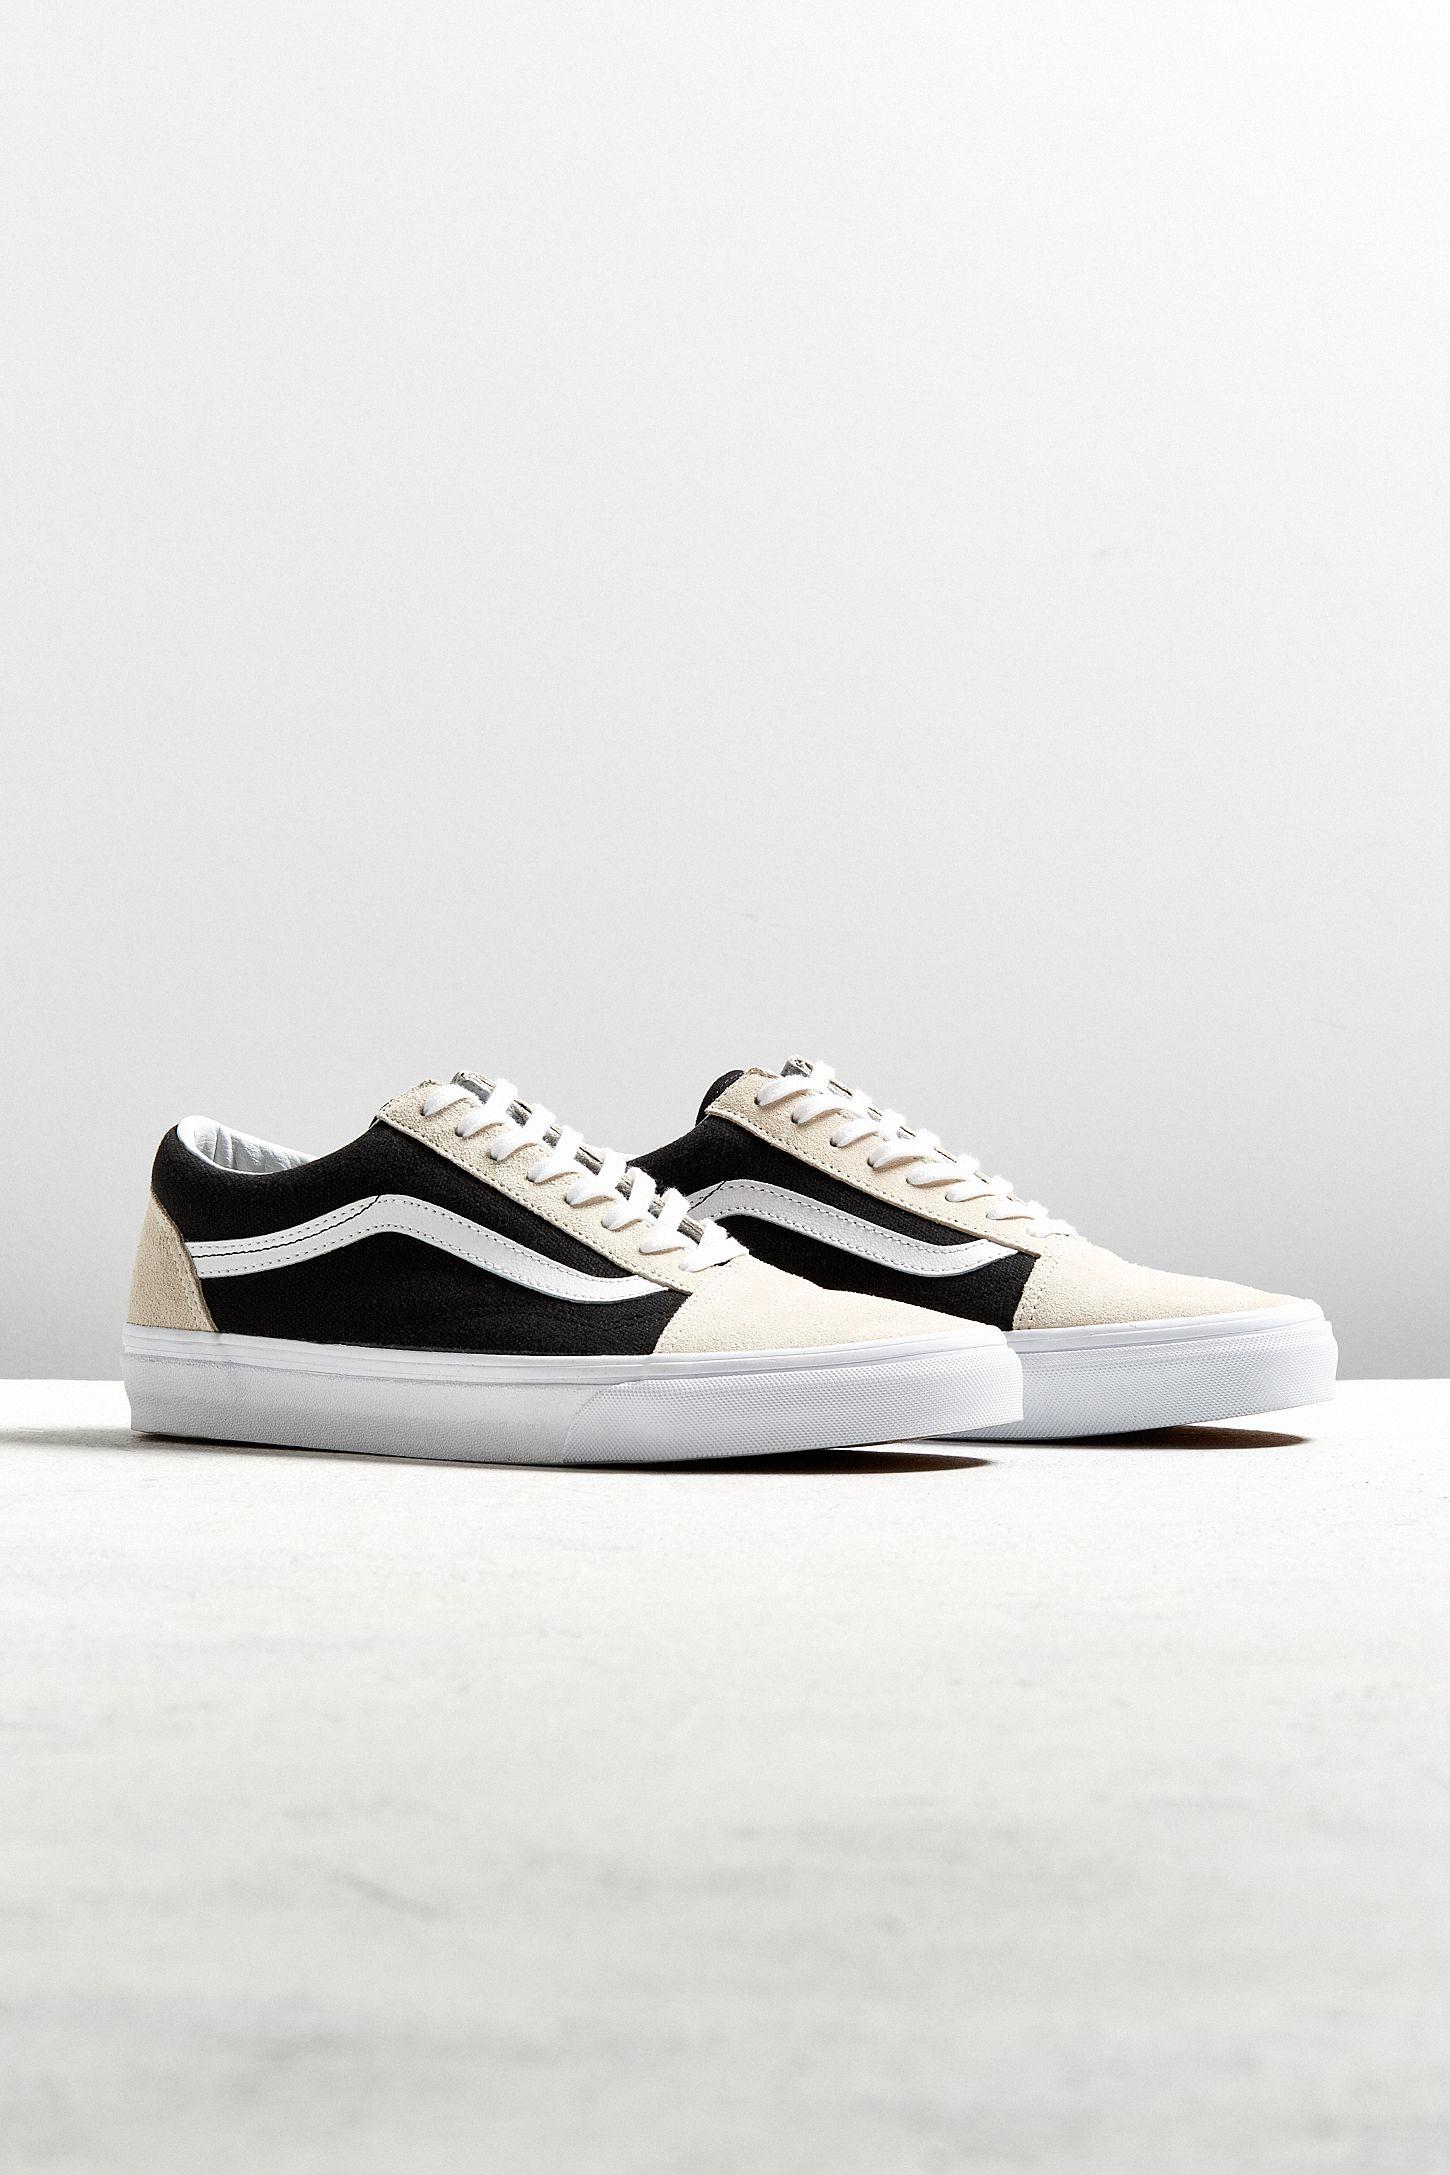 3d2c6eb76e Vans Old Skool Black + Birch Two-Tone Sneaker